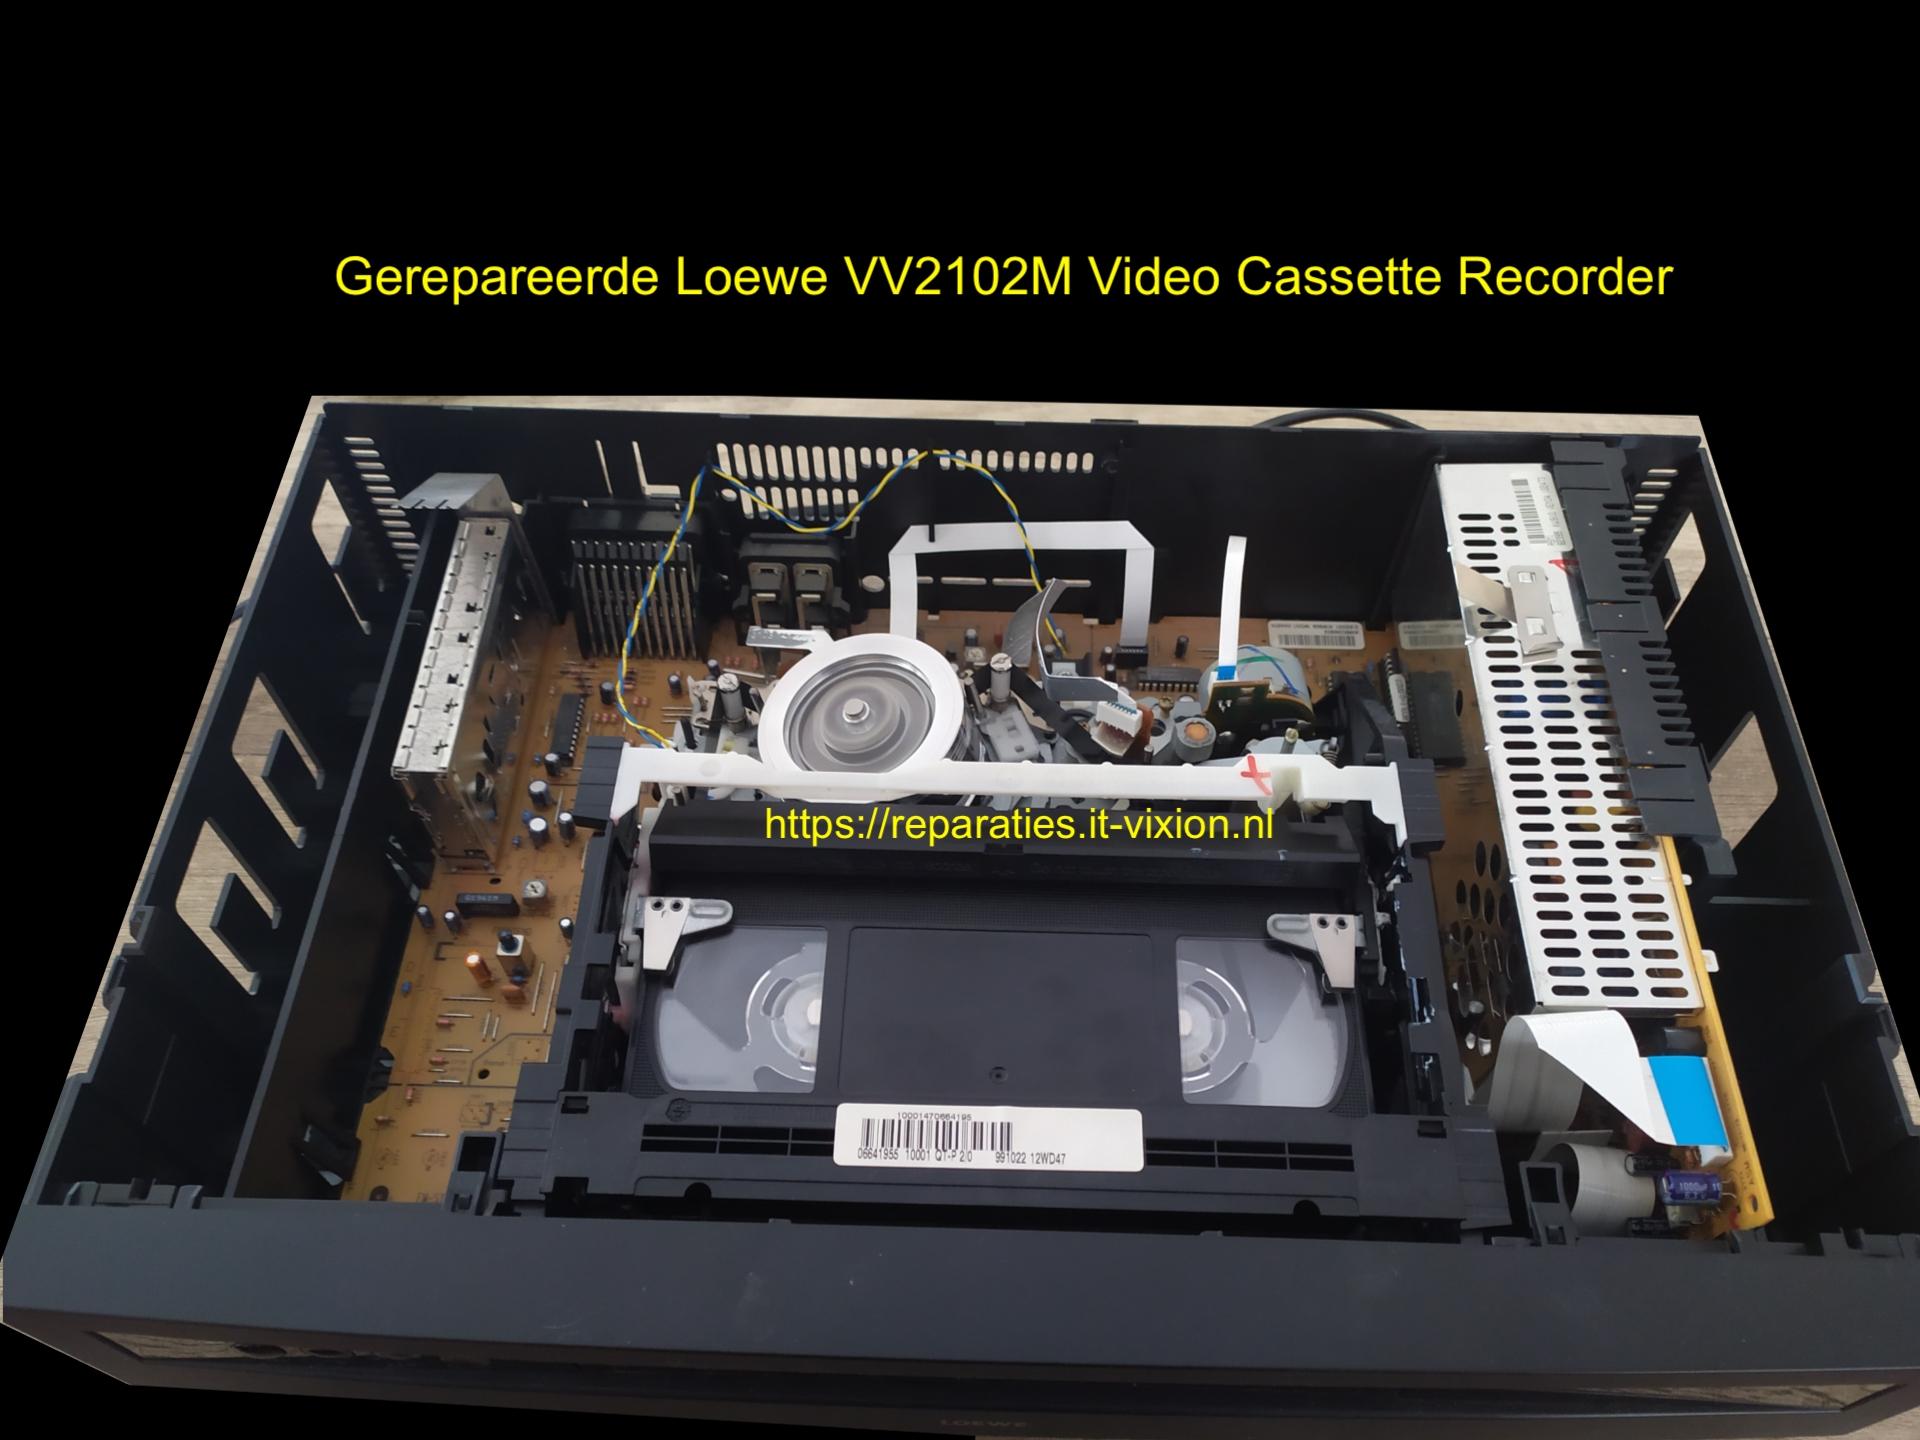 Loewe VV2102M Video Cassette Recorder